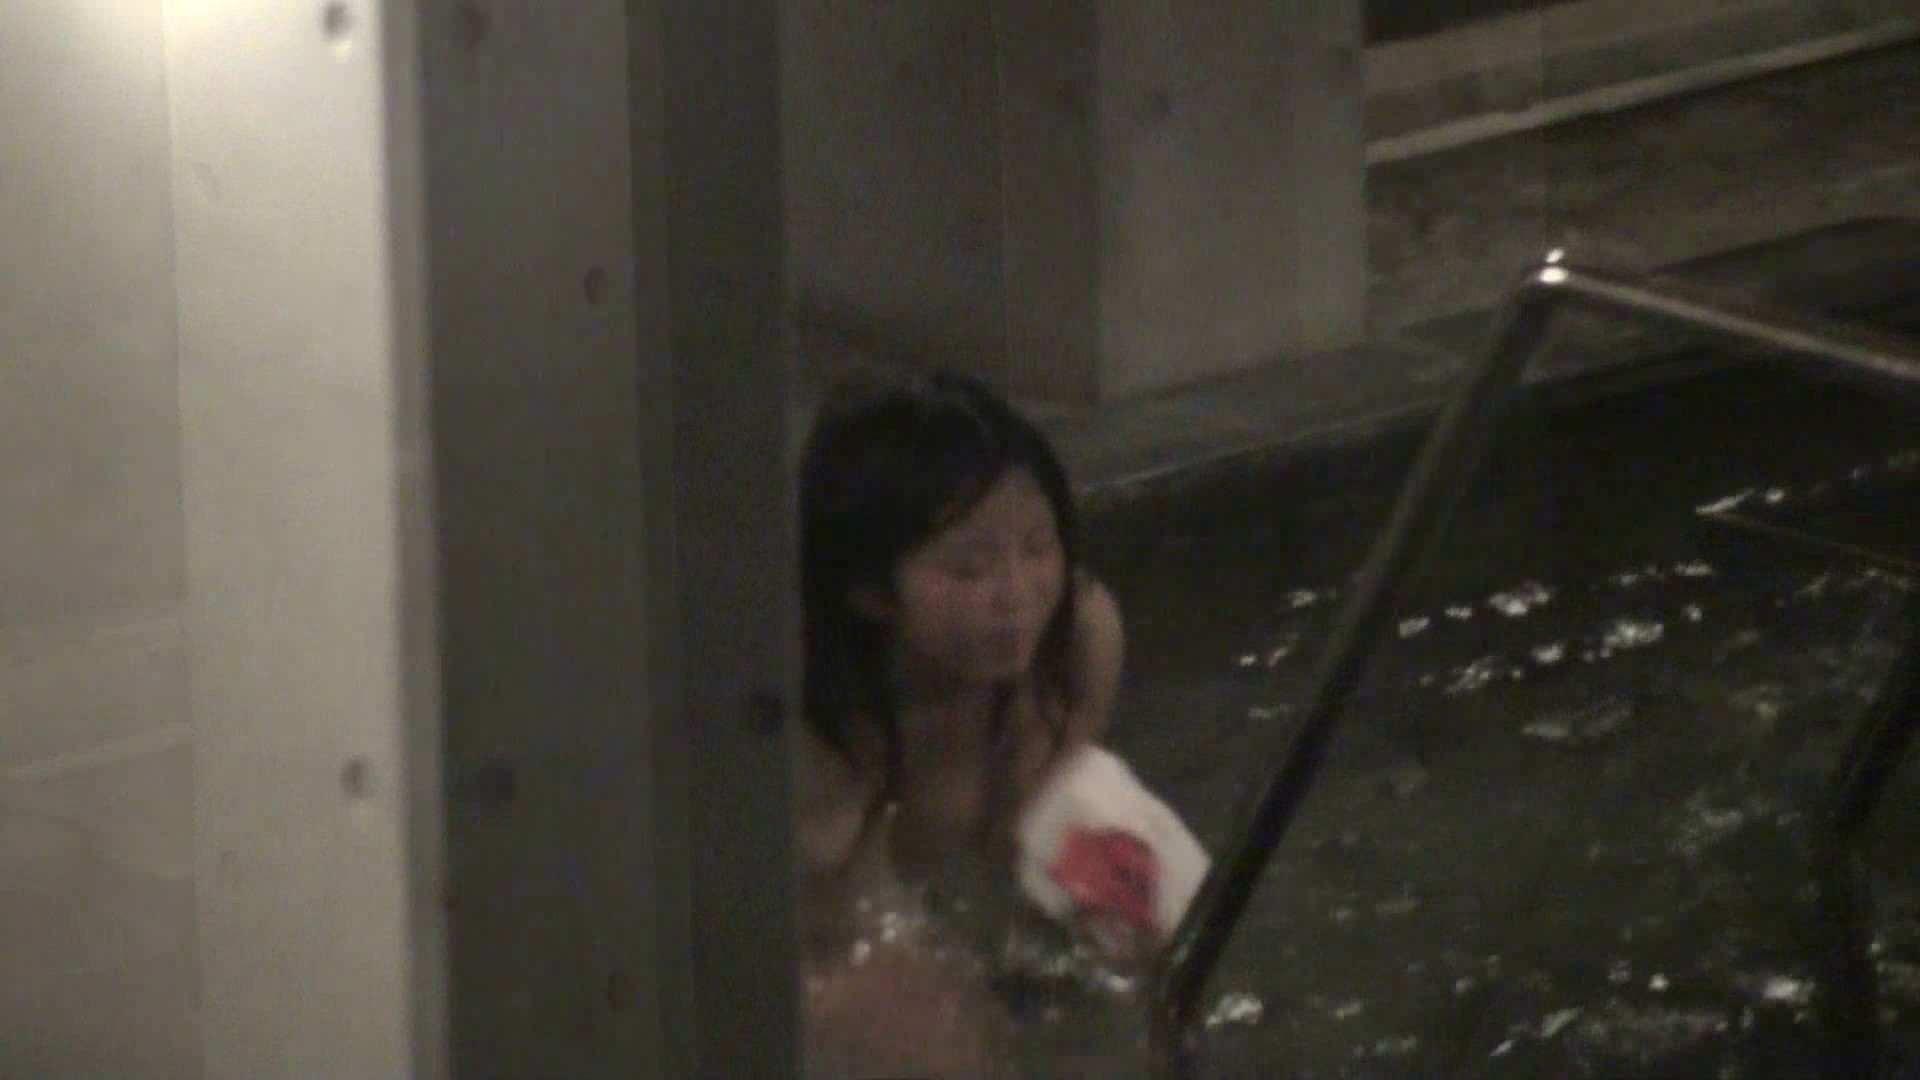 Aquaな露天風呂Vol.326 0 | 0  104連発 45